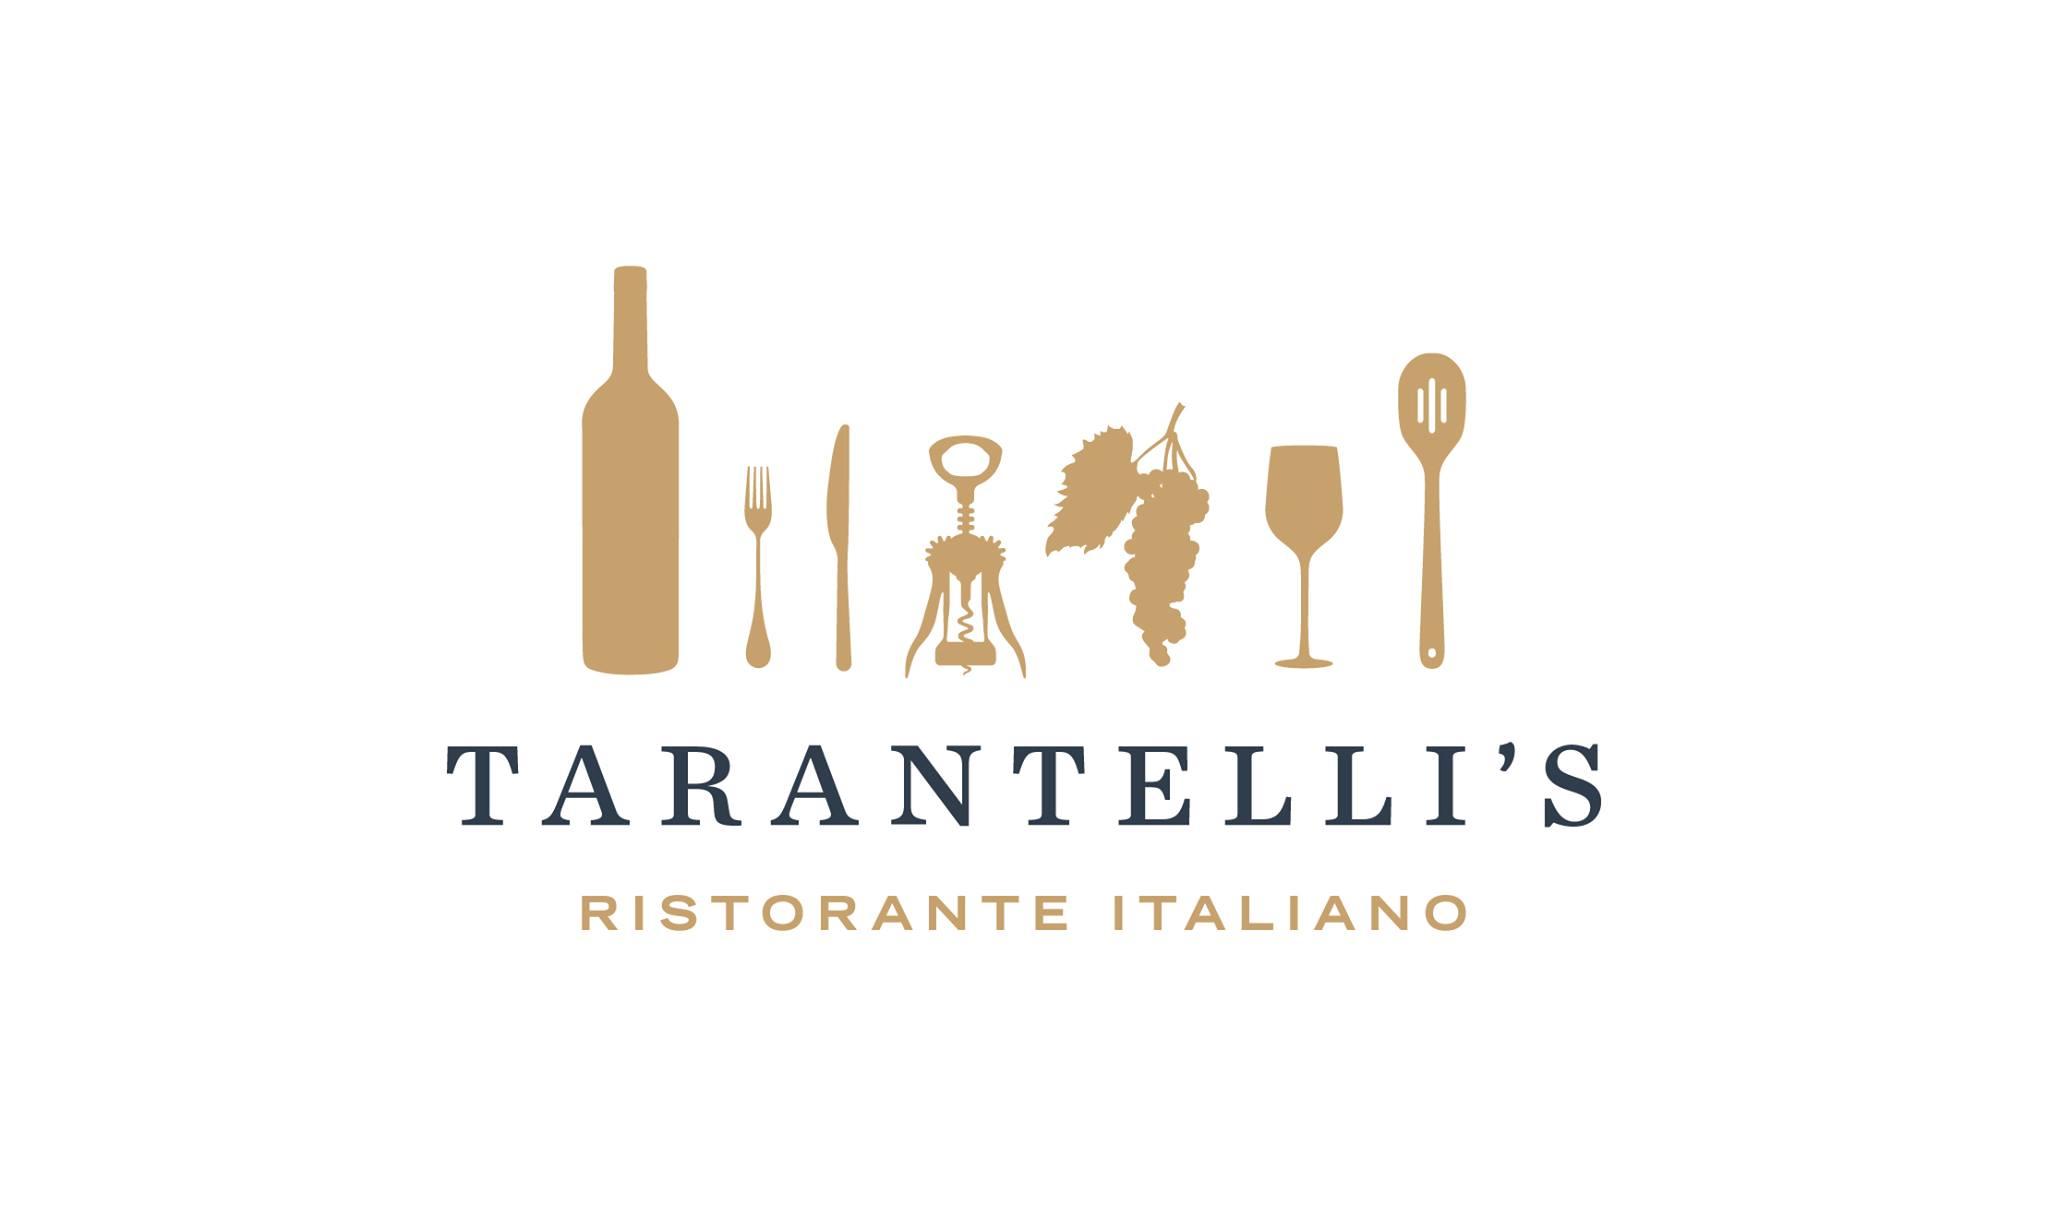 Tarantellis Ristorante Italiano